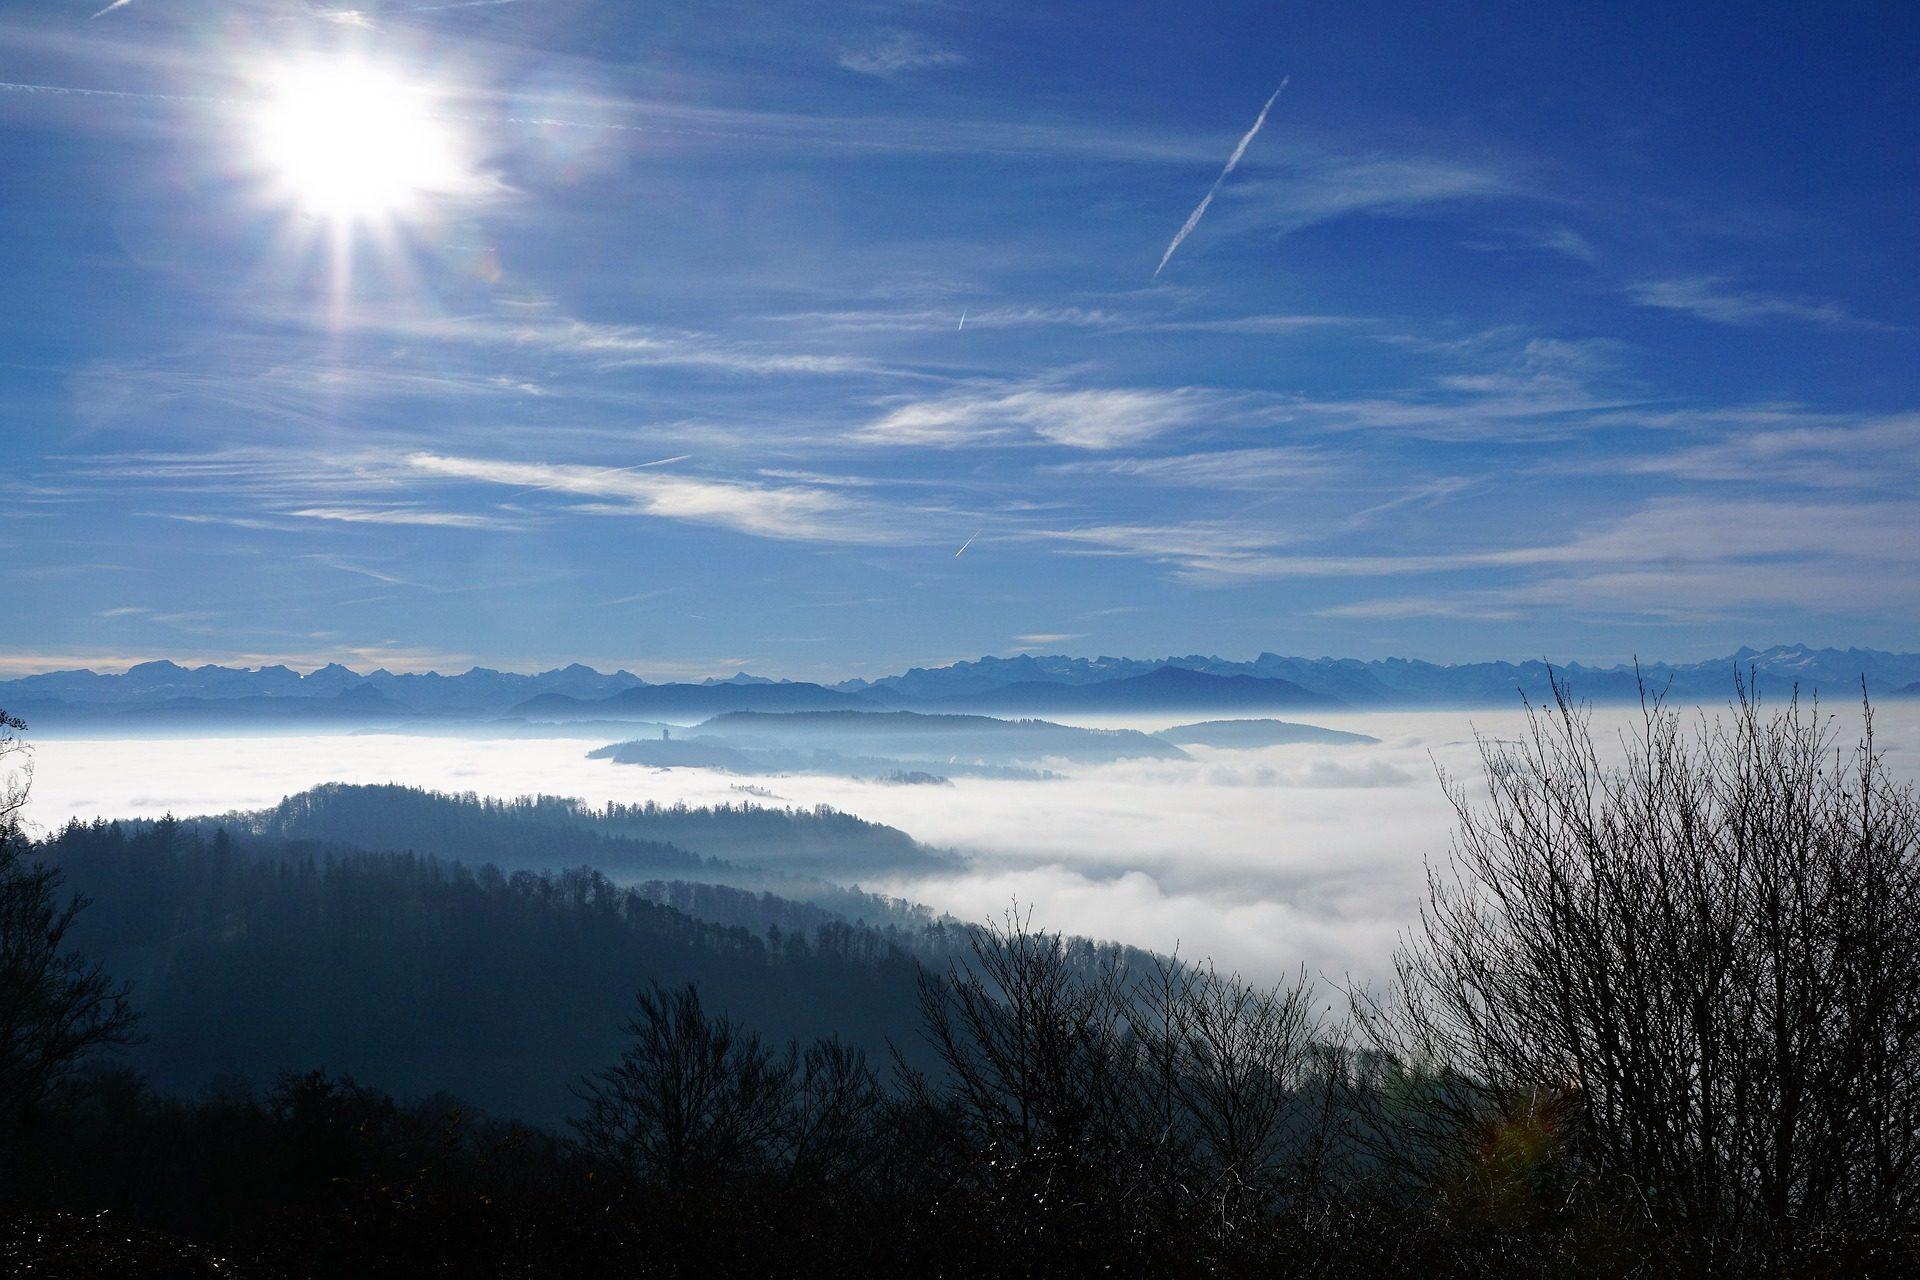 Montañas, nuages, Sky, arbres, Uetliberg, Zurich - Fonds d'écran HD - Professor-falken.com